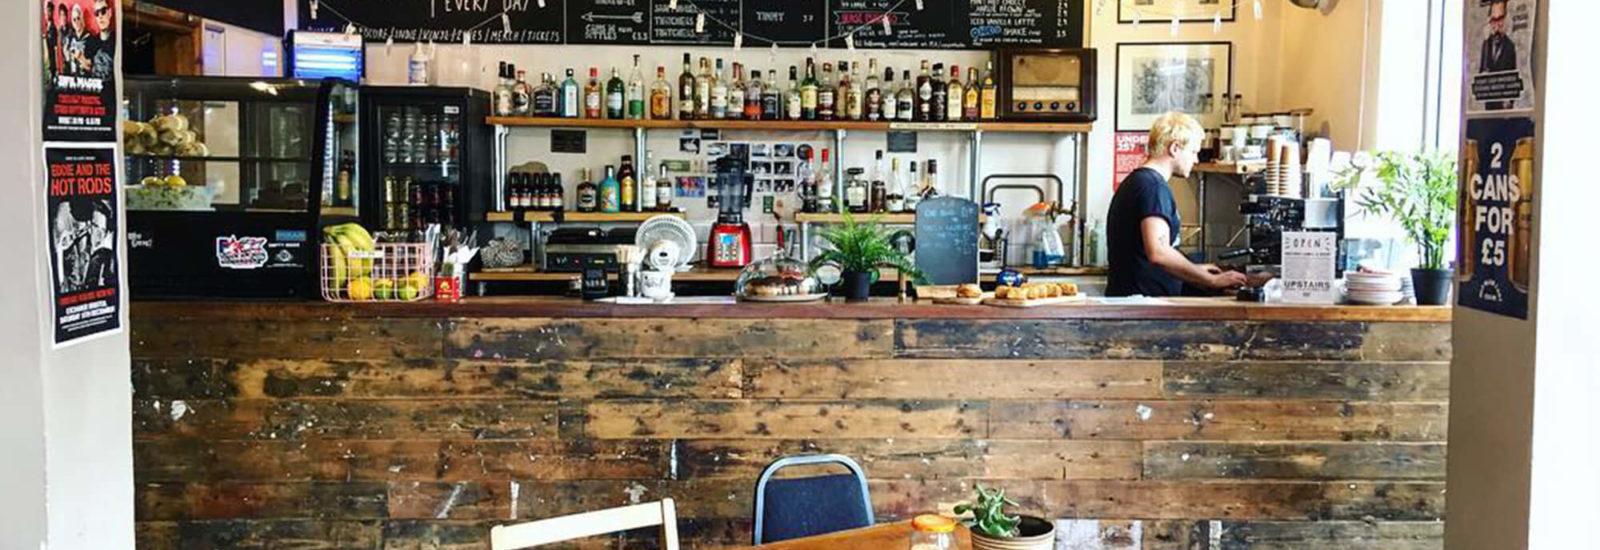 Image of Exchange Coffee Shop & Kitchen